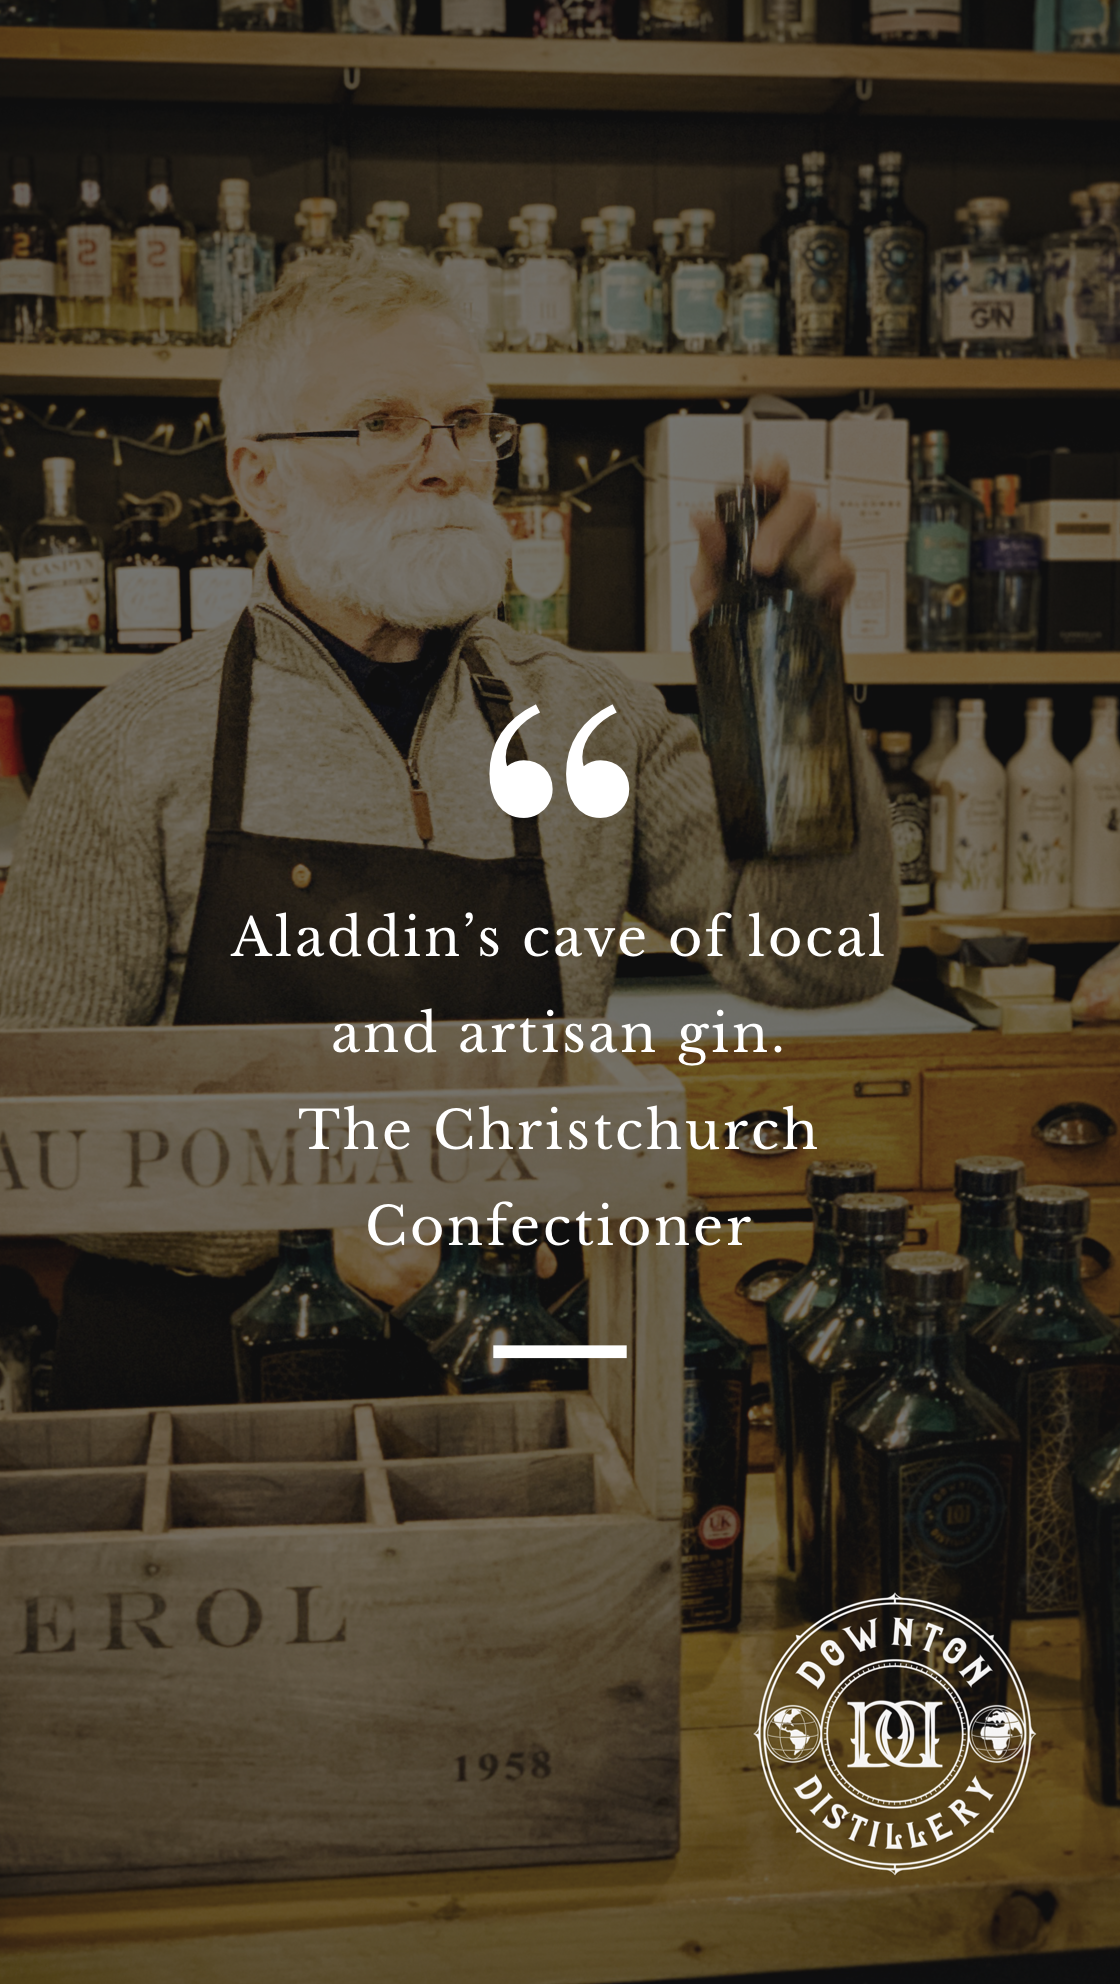 Christchurch Confectioner